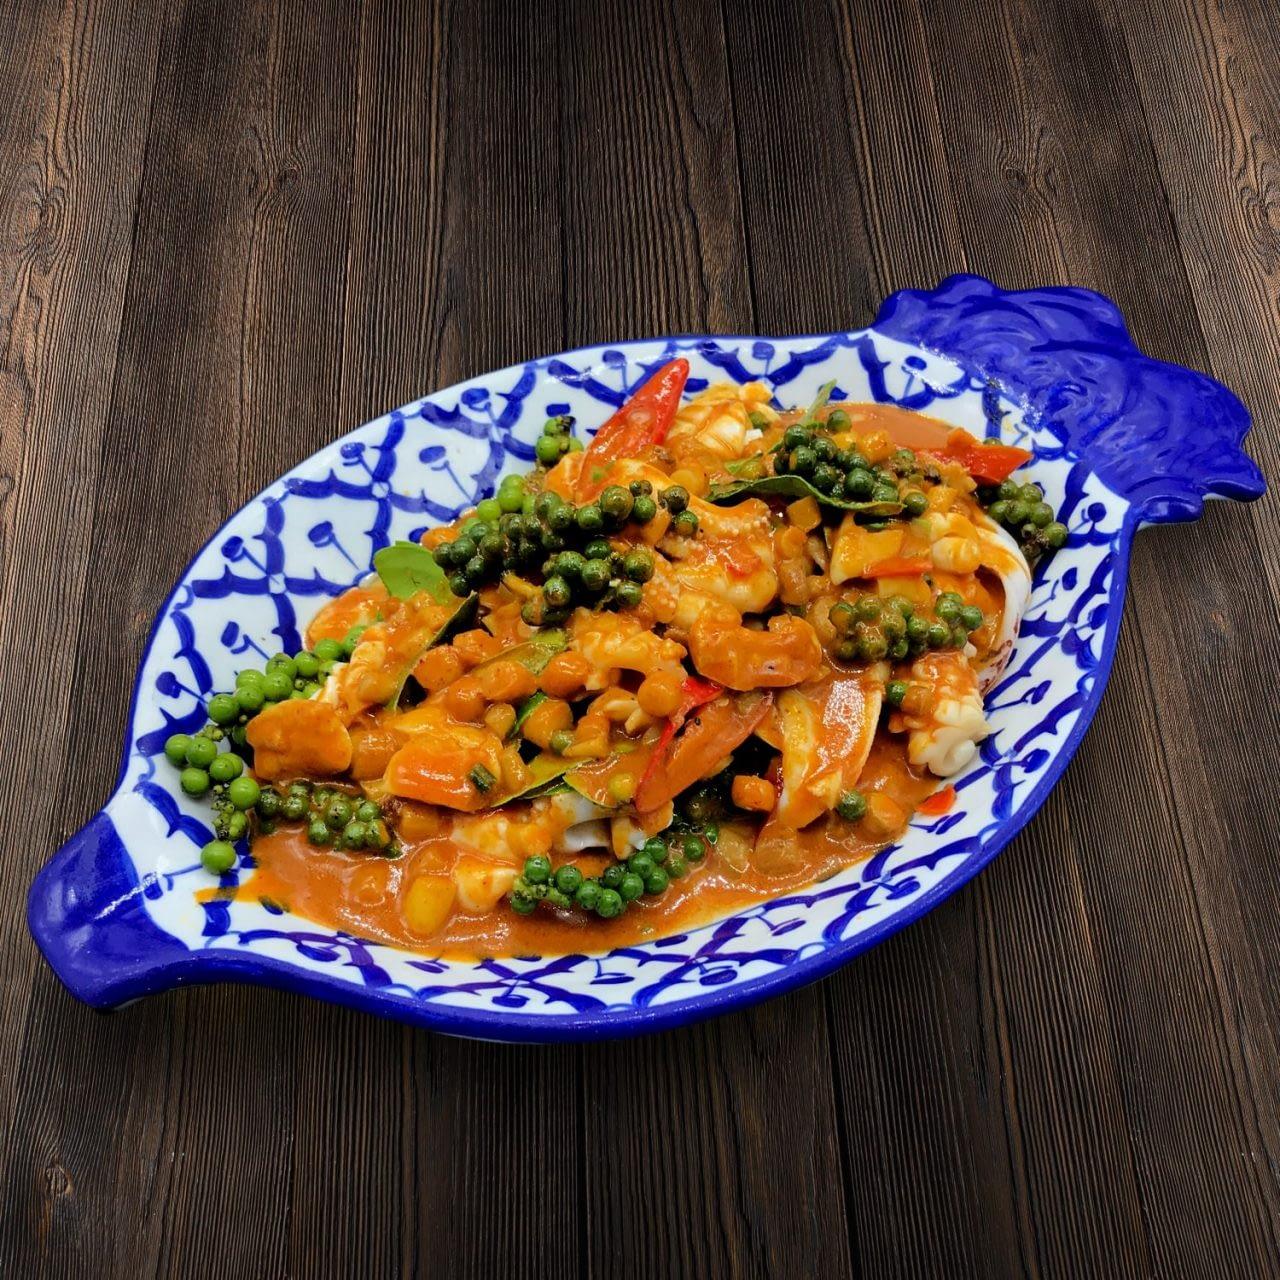 Thai Food Delivery Kuala Lumpur Stir Fried Squid with Phrik Thai-min